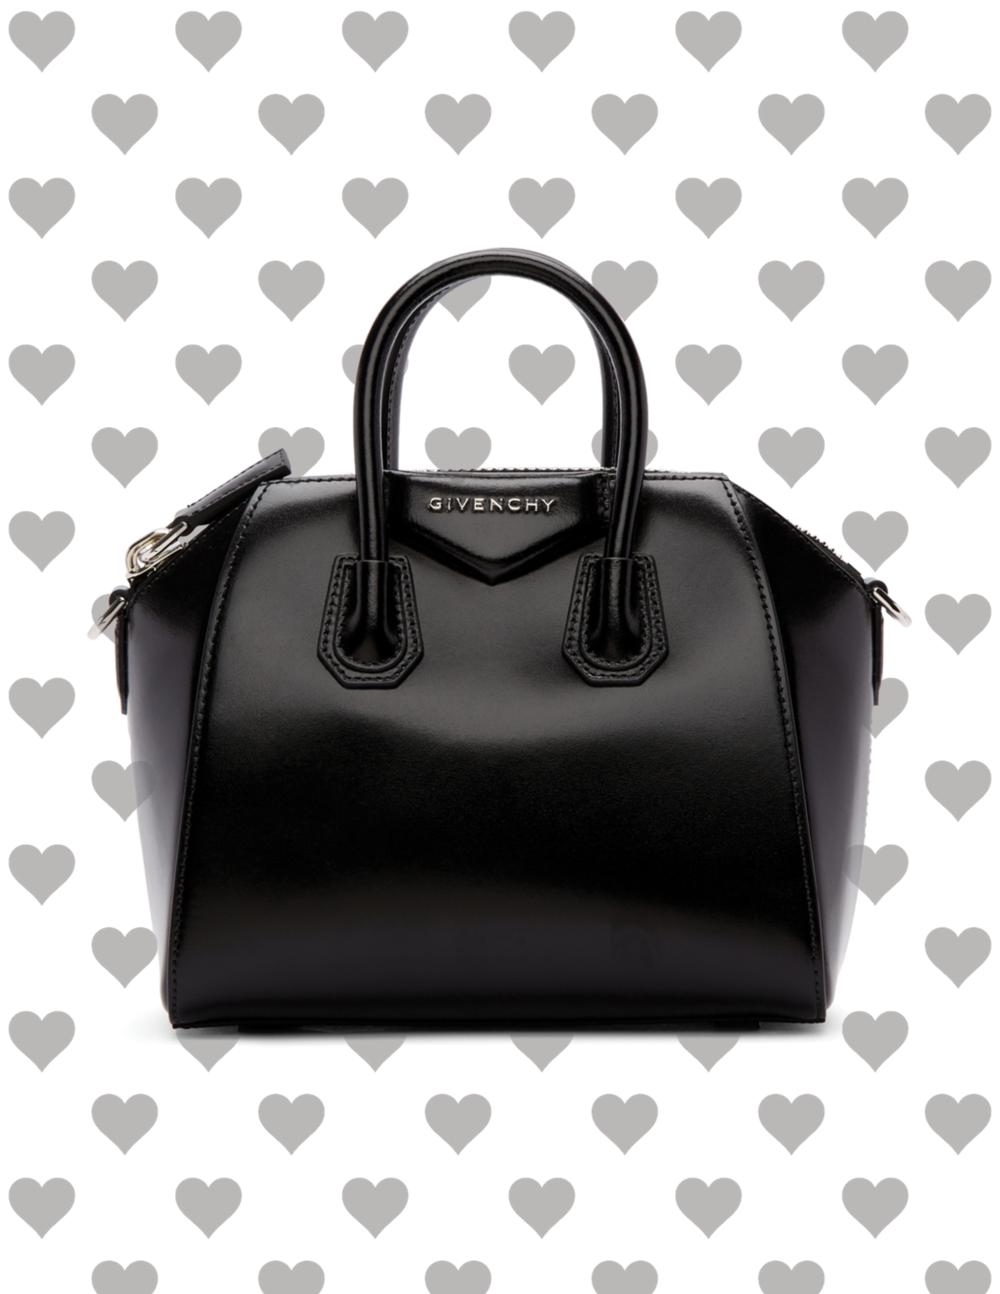 Designer Handbag Wishlist #2 Antigona